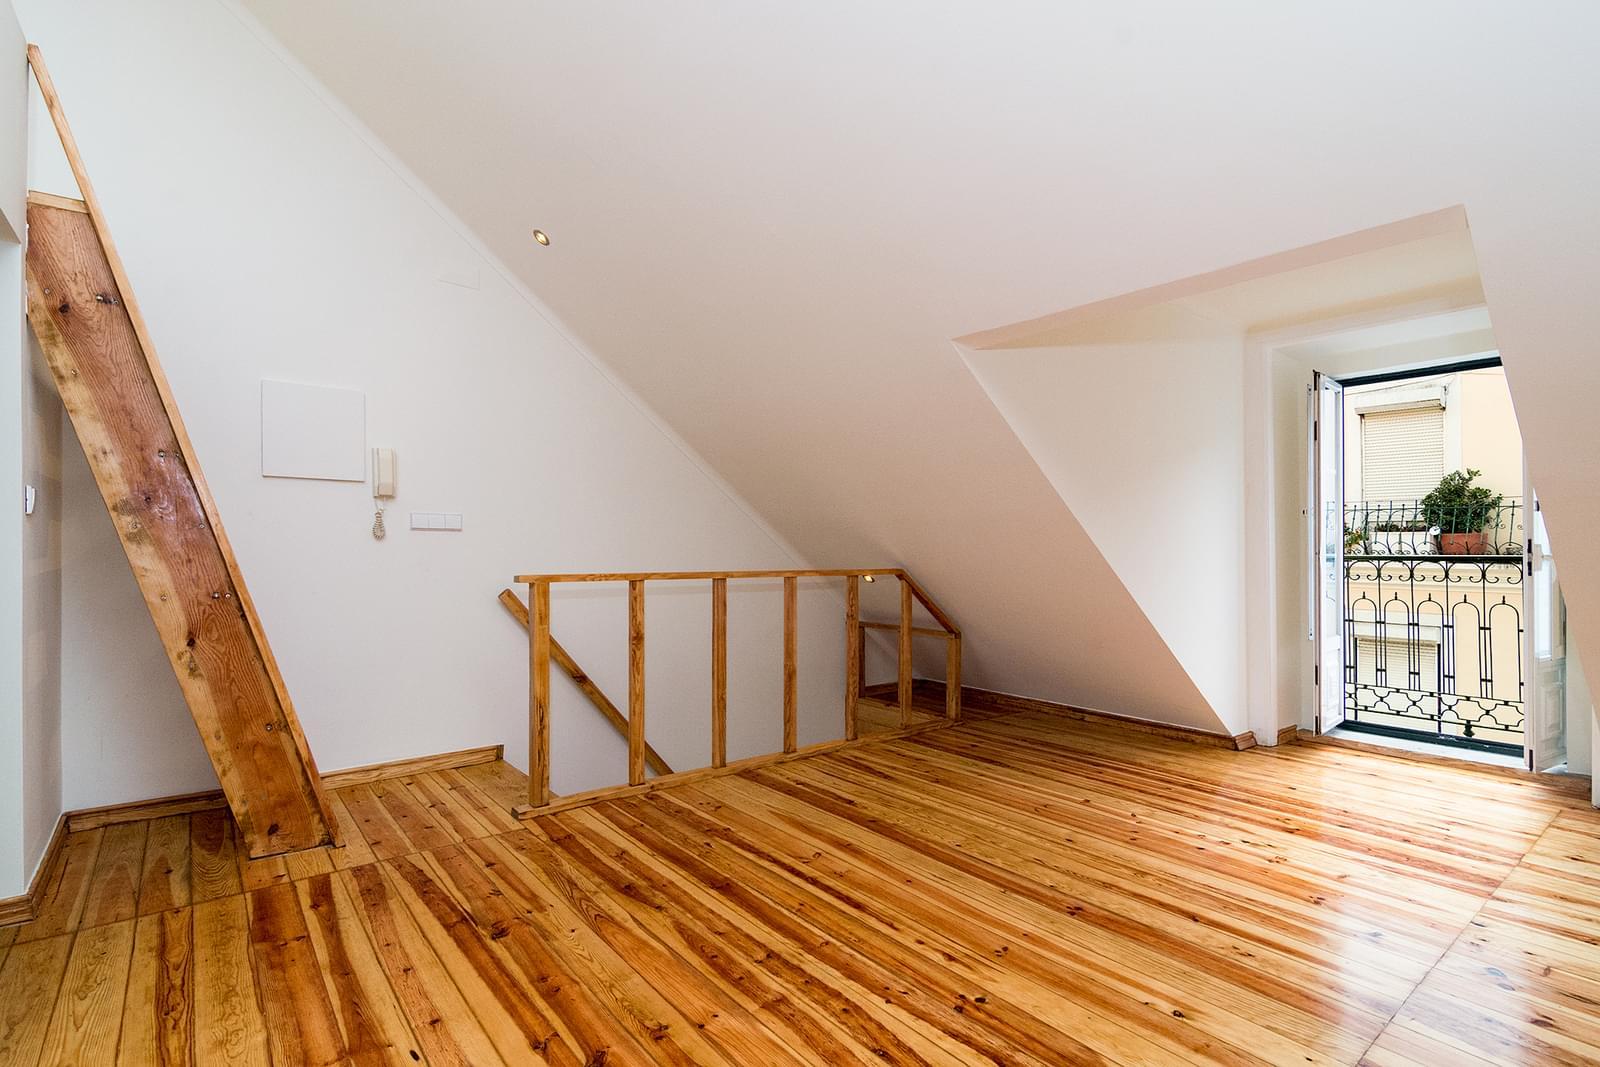 pf17176-apartamento-t0-lisboa-eb4983e2-0c28-4bab-a255-31d94ee82e56